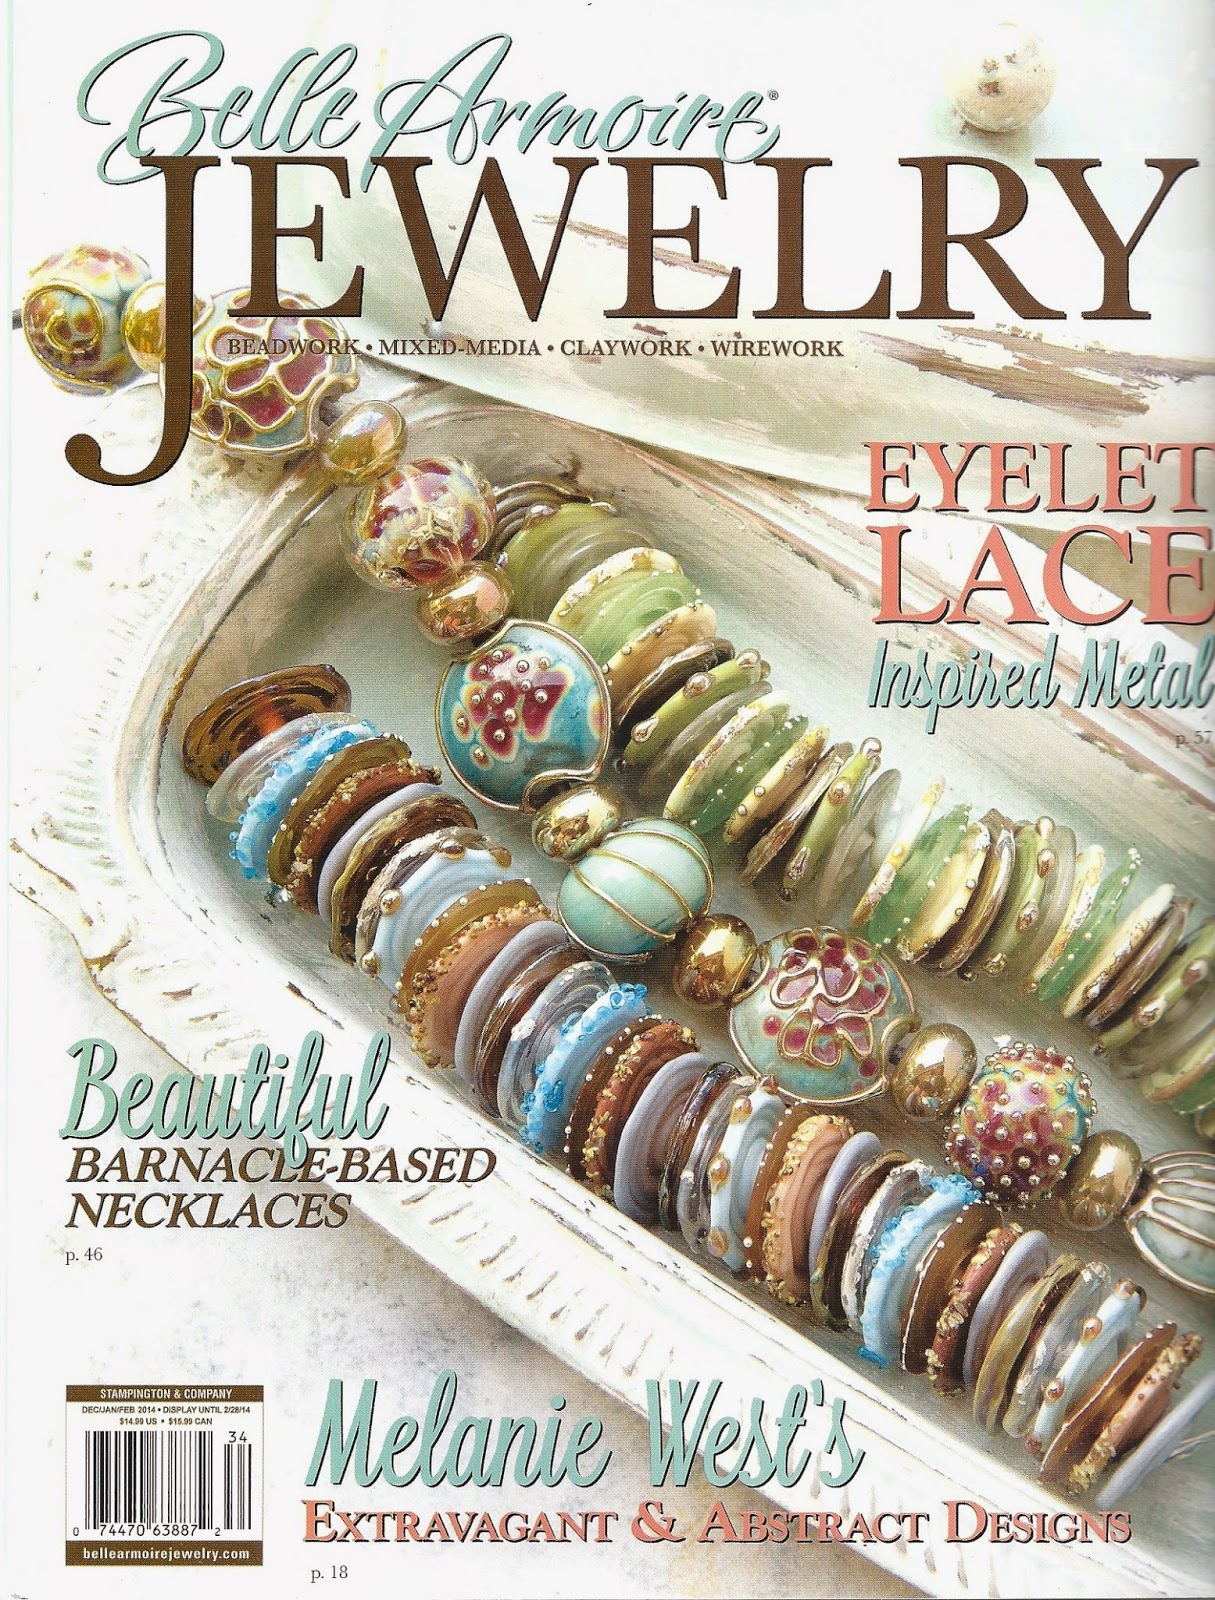 http://katalinajewelrypublishedwork.blogspot.com/2014/04/reclaimed-brass-picture-frame-pendants.html